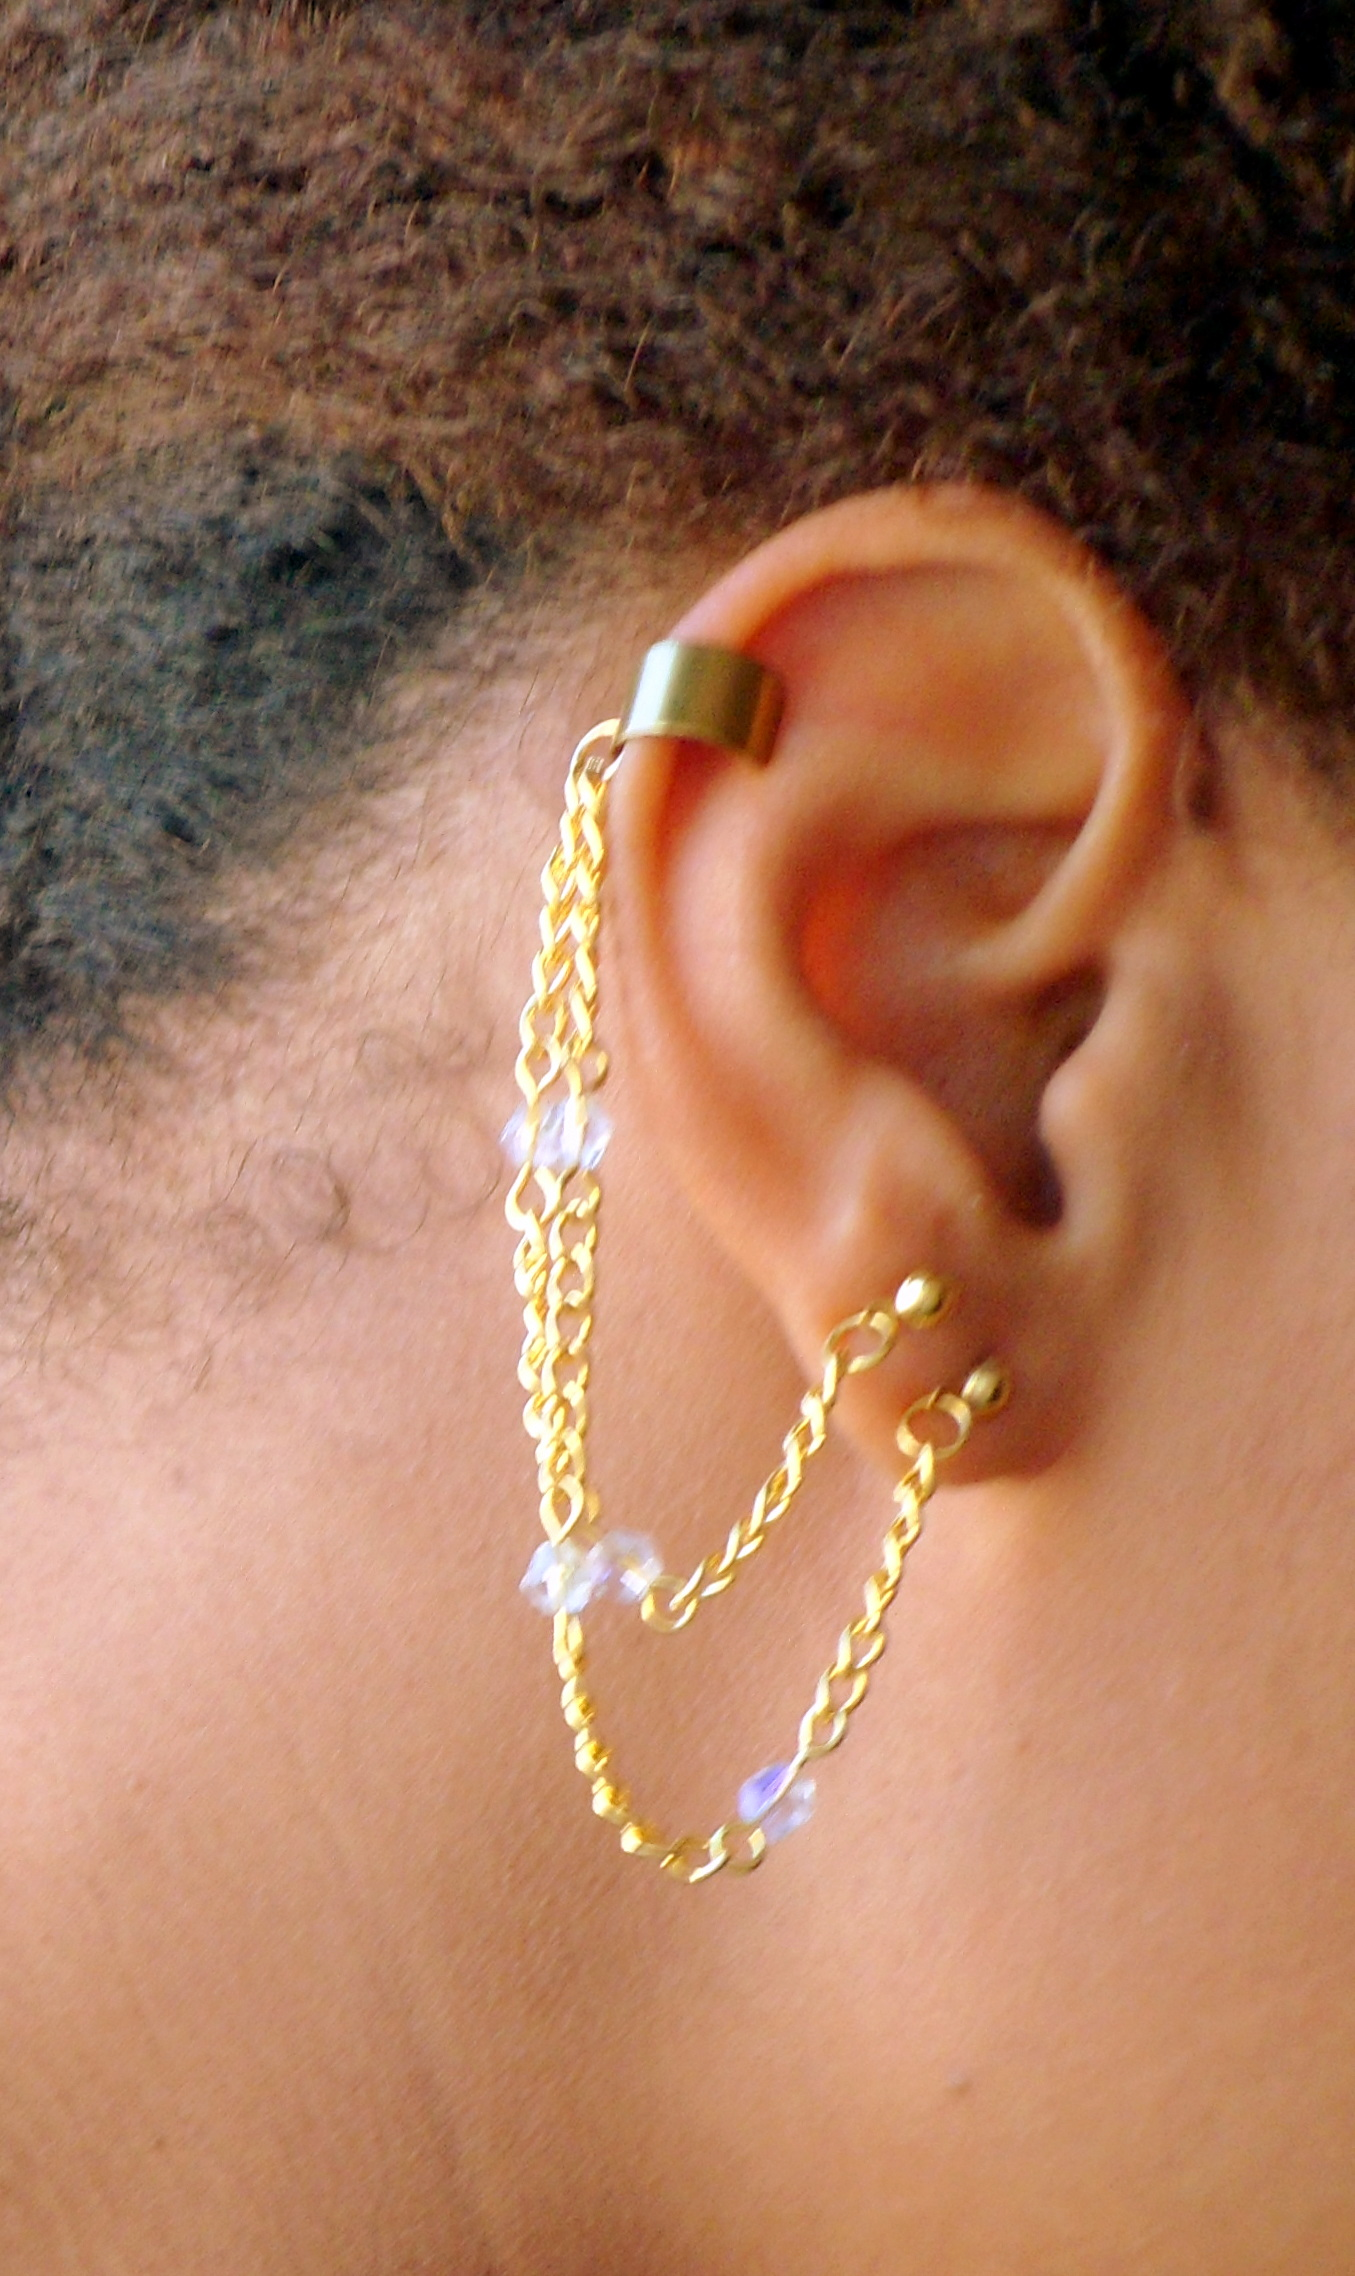 Swarovski Crystal Double Pierced Golden Chain Ear Cuff Wrap No Piercing Needed For Cartilage